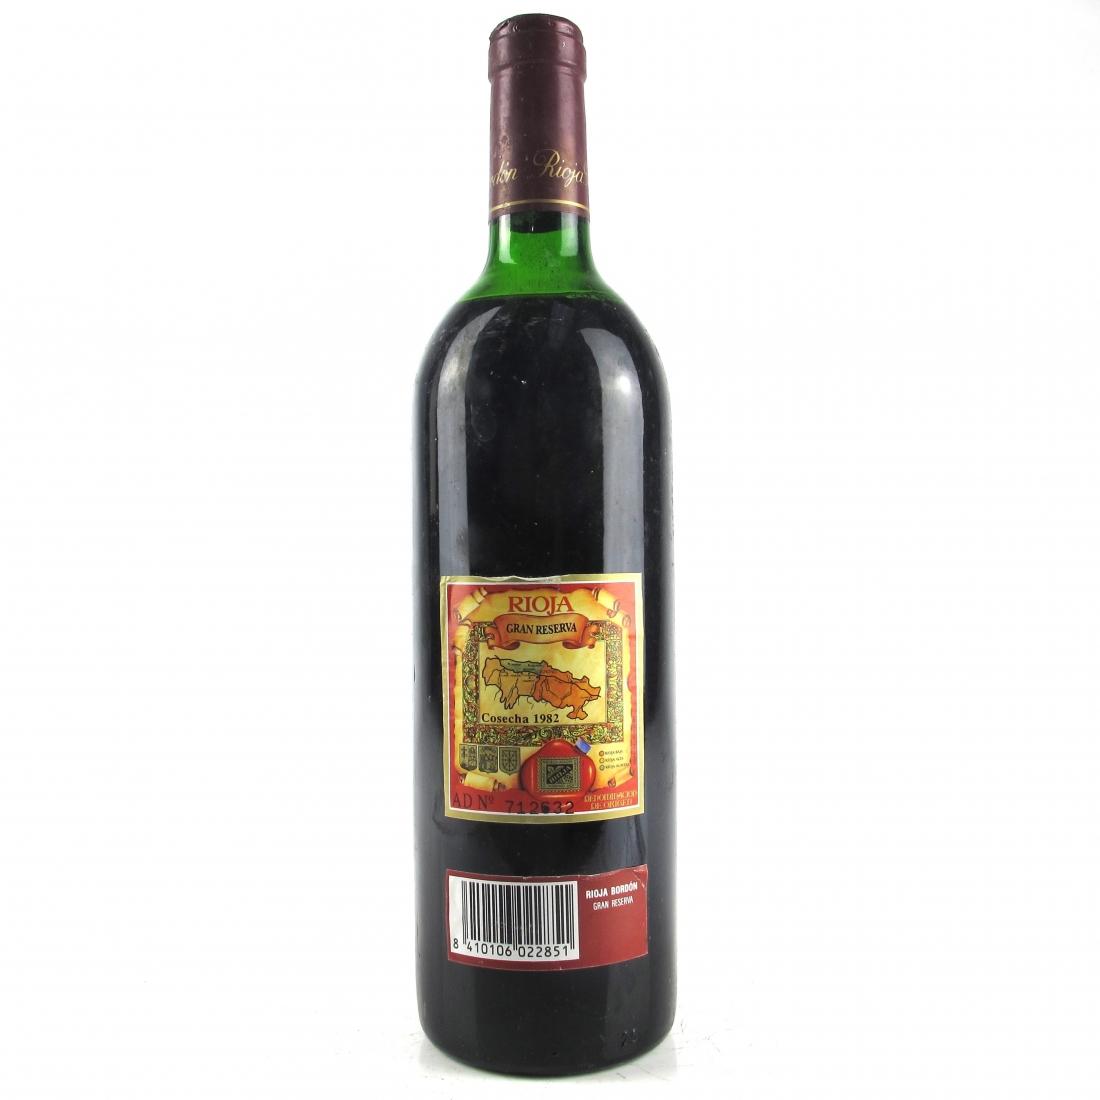 Bordon 1982 Rioja Gran Reserva